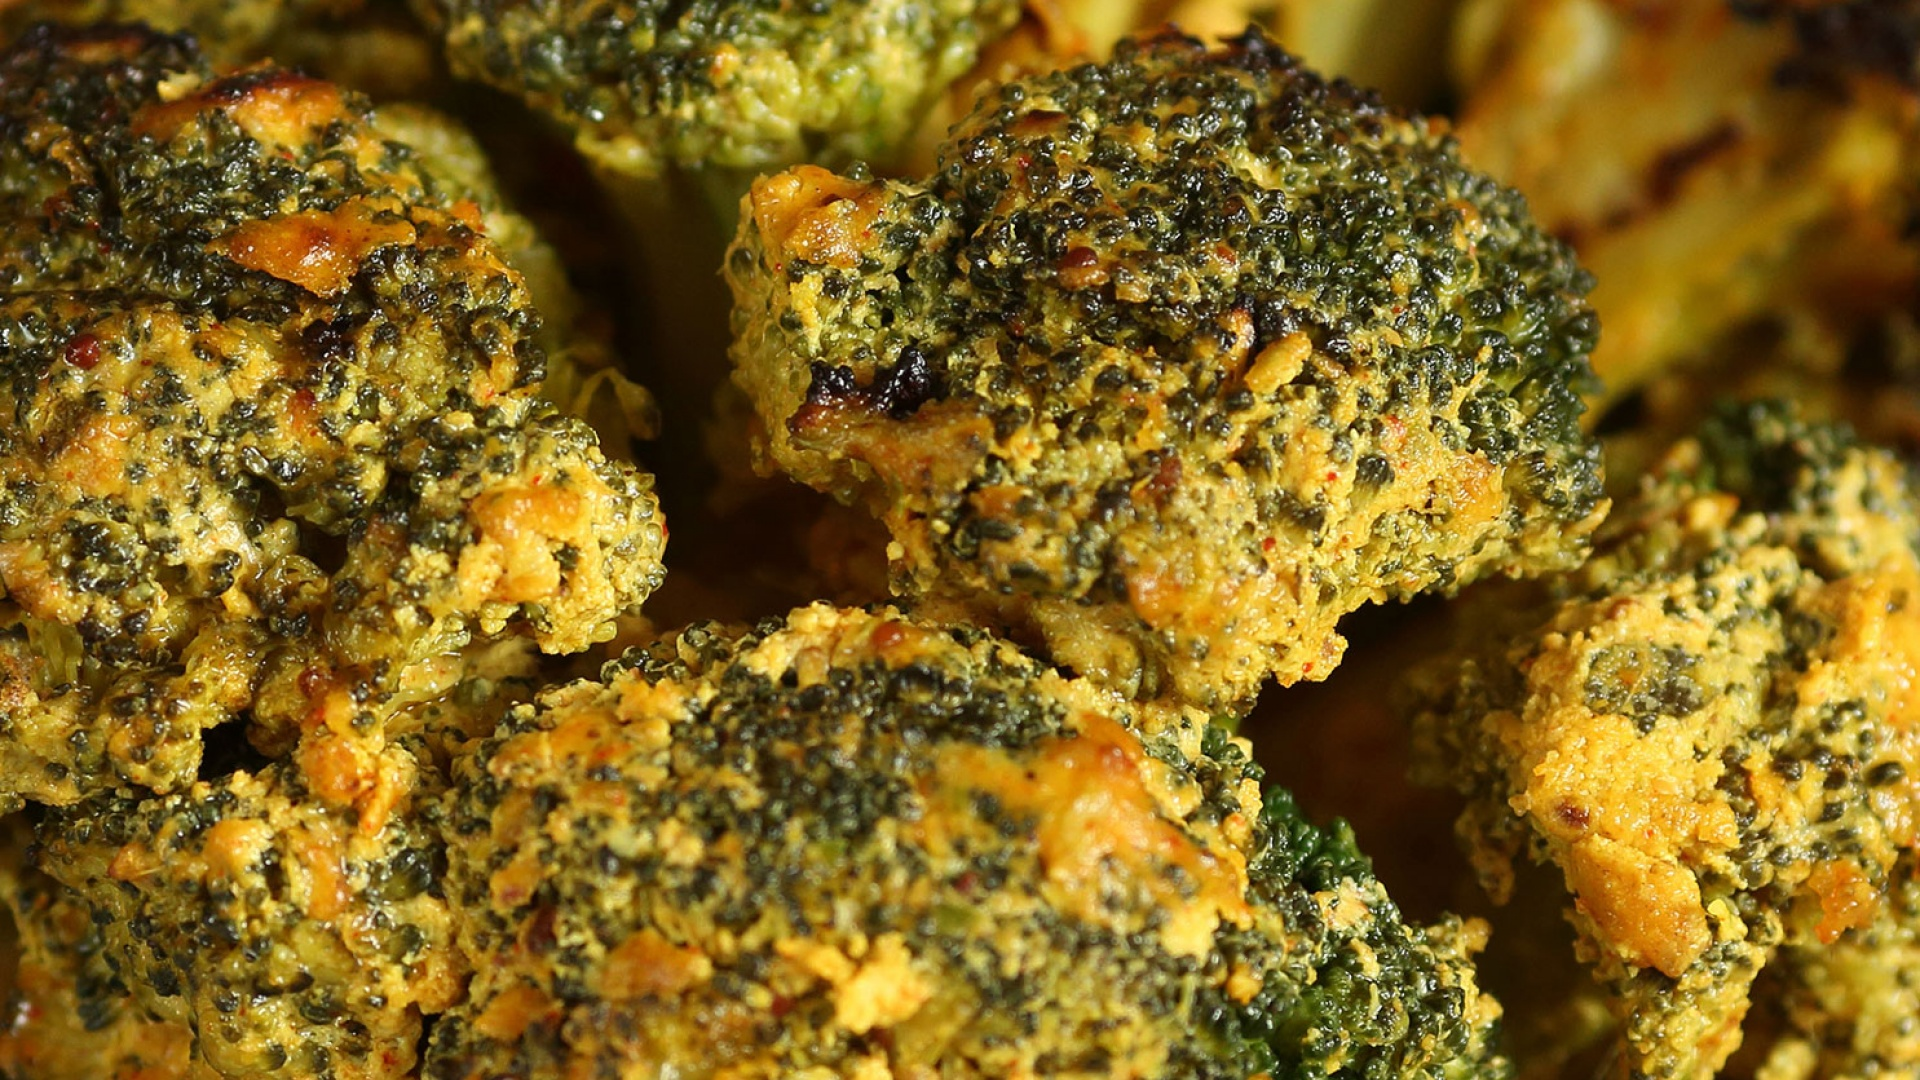 Gunpowder broccoli